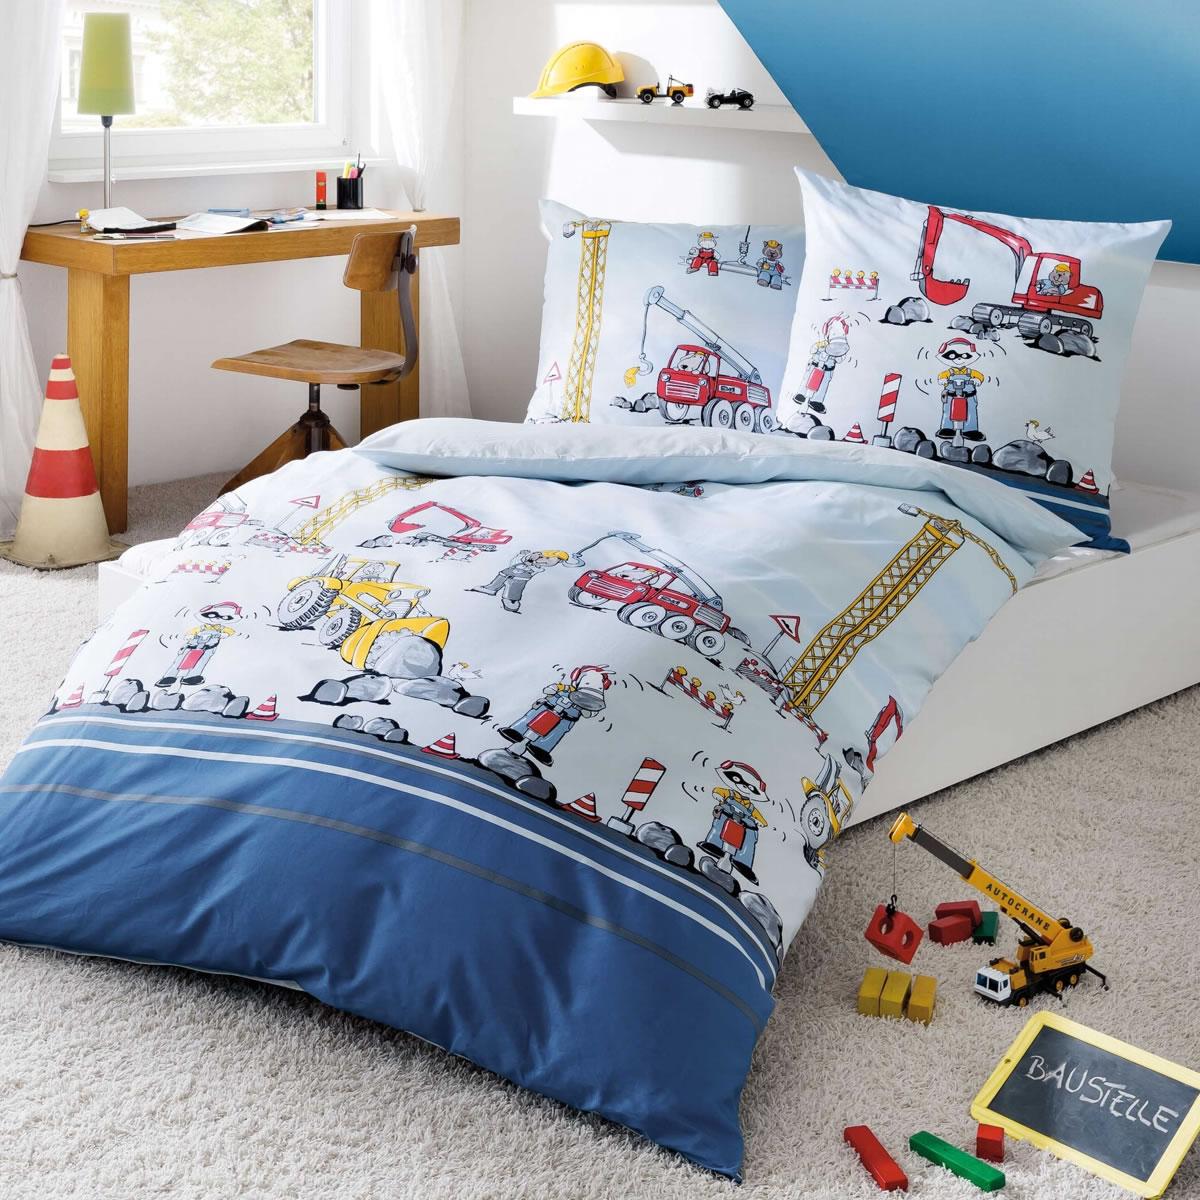 Kaeppel Biber Kinderbettwäsche 135x200 Cm Design 6801 Baustelle Blau